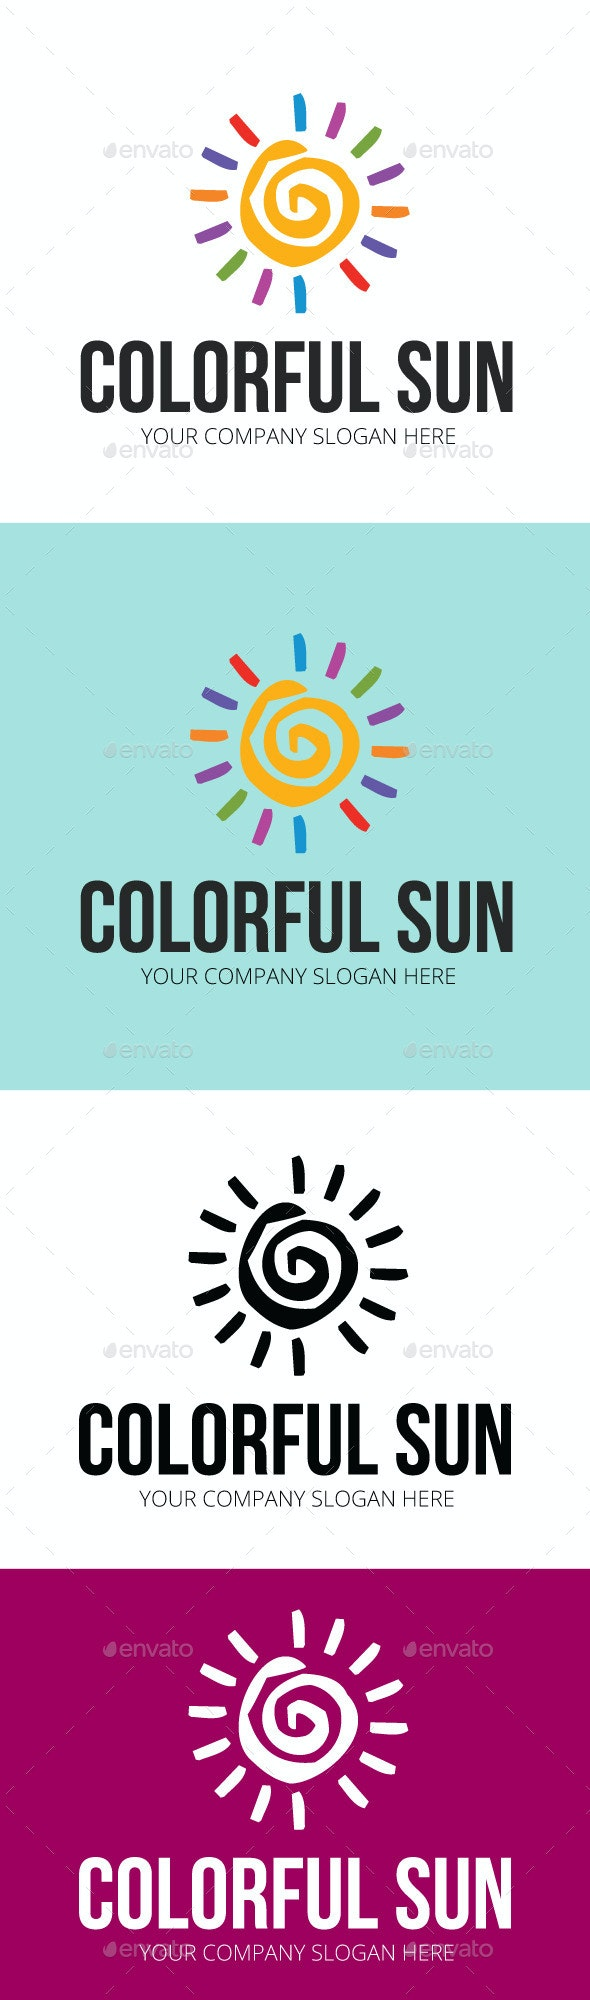 Colorful Sun Logo Template - Nature Logo Templates